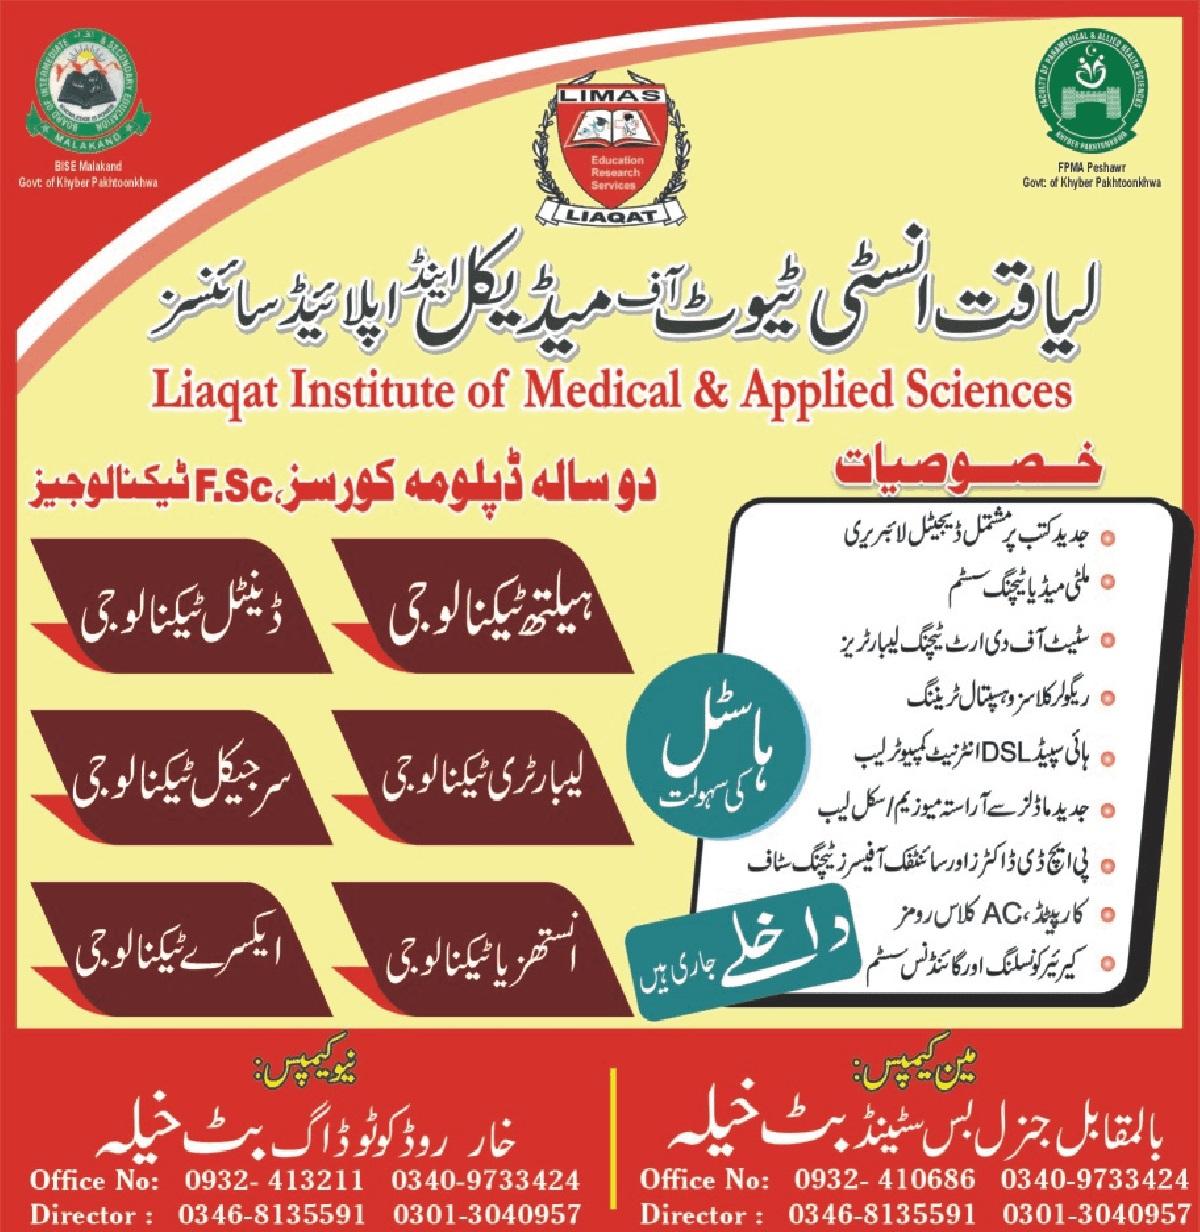 Liaqat Institute Of Medical & Applied Sciences Batkhela Admissions